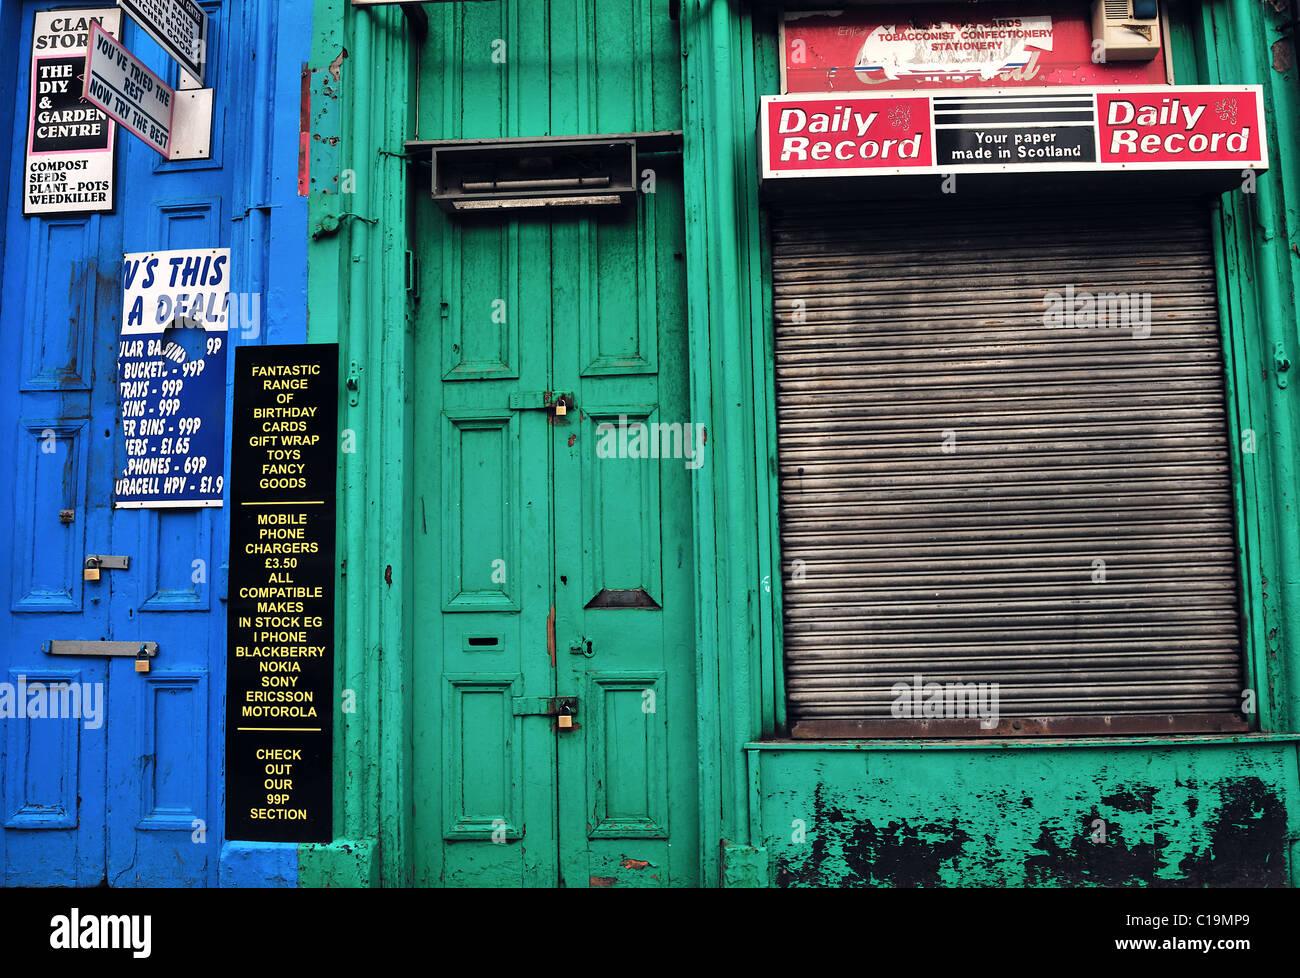 Run-down shops in Argyle Street, Glasgow - Stock Image